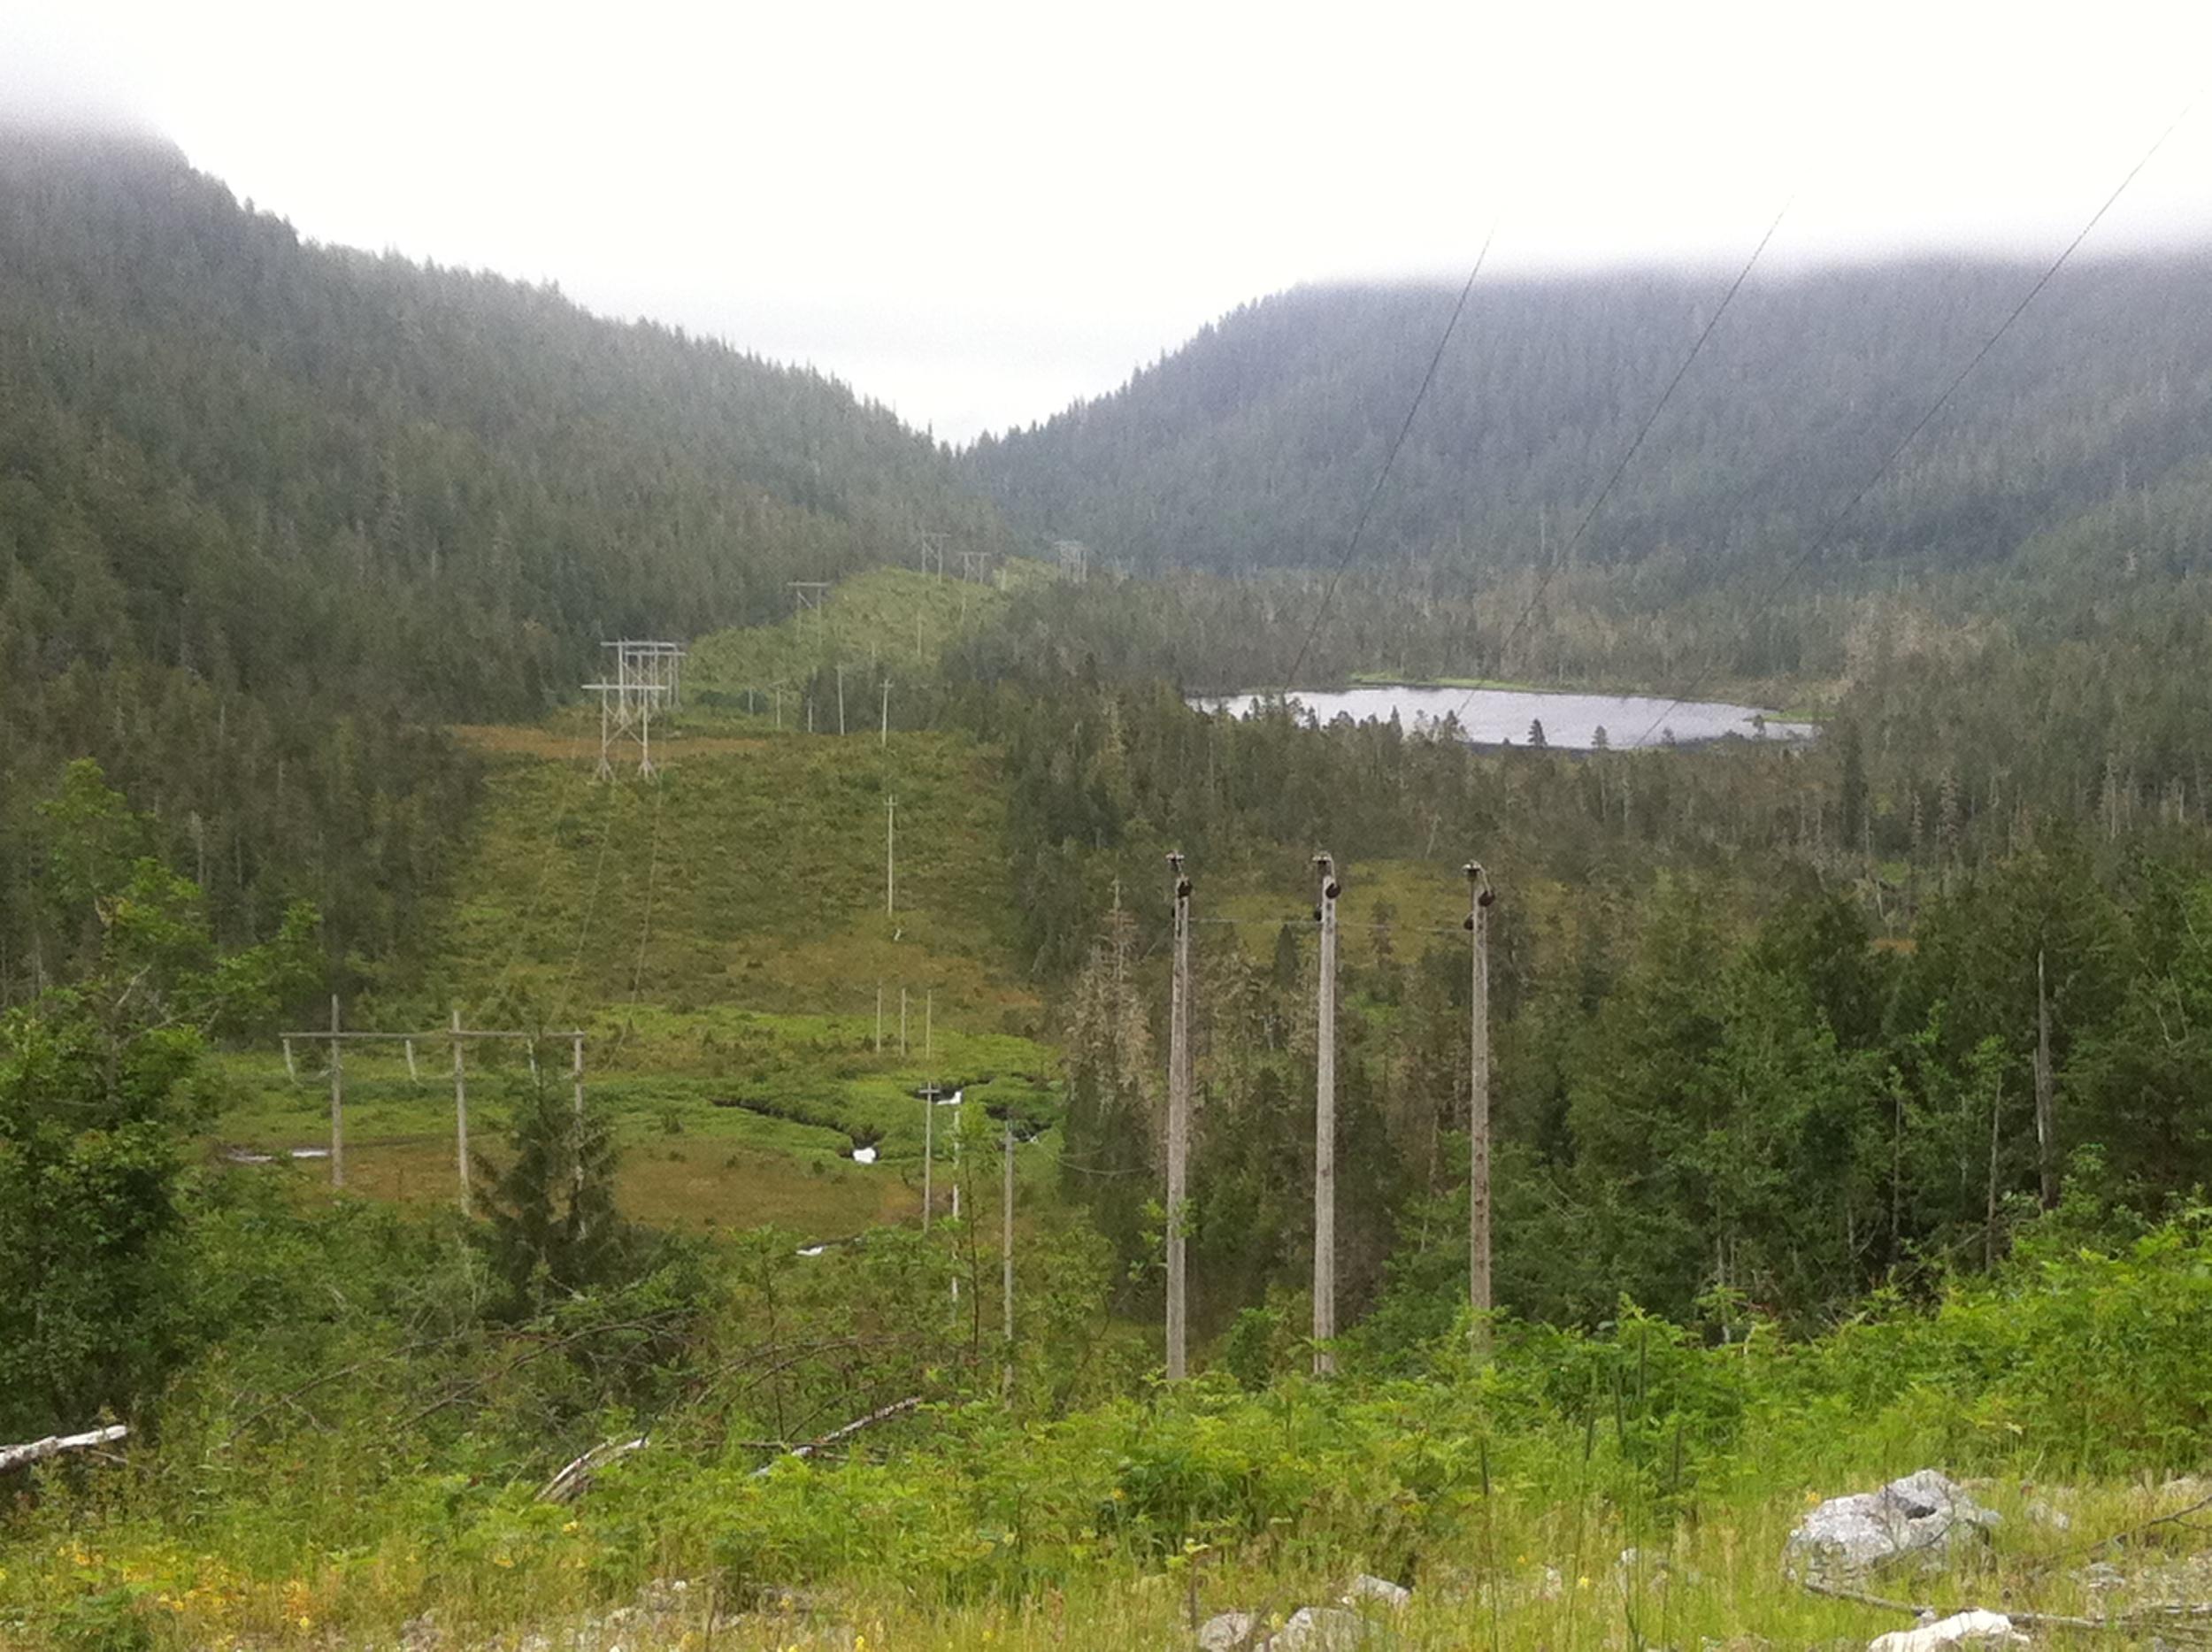 Transmission line down ravine